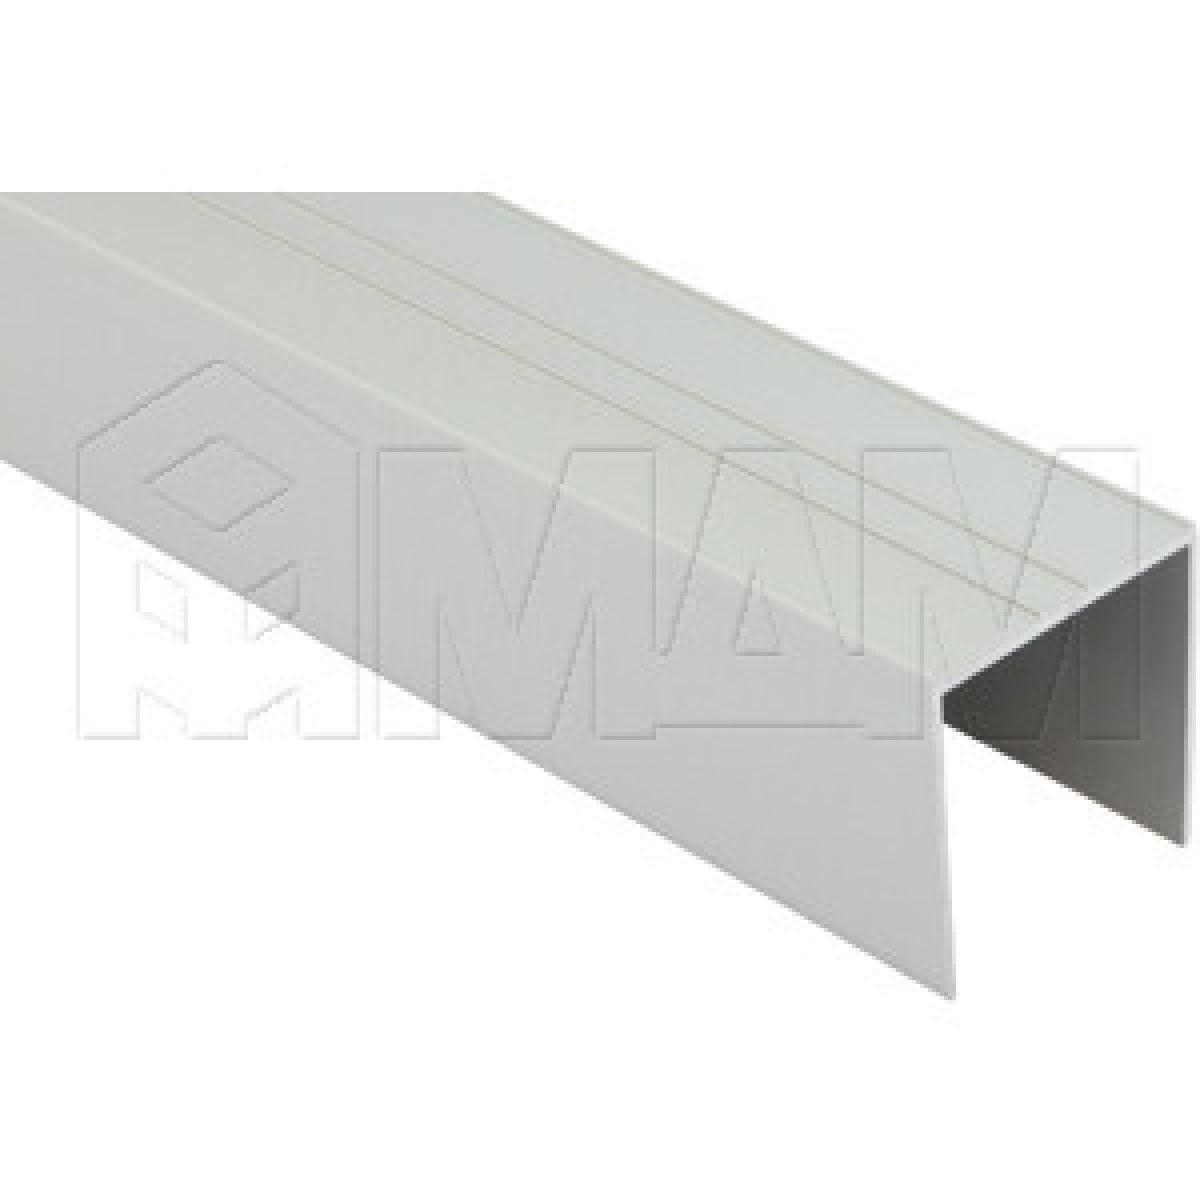 INTEGRO Направляющая одинарная верхняя серебро, L-6000